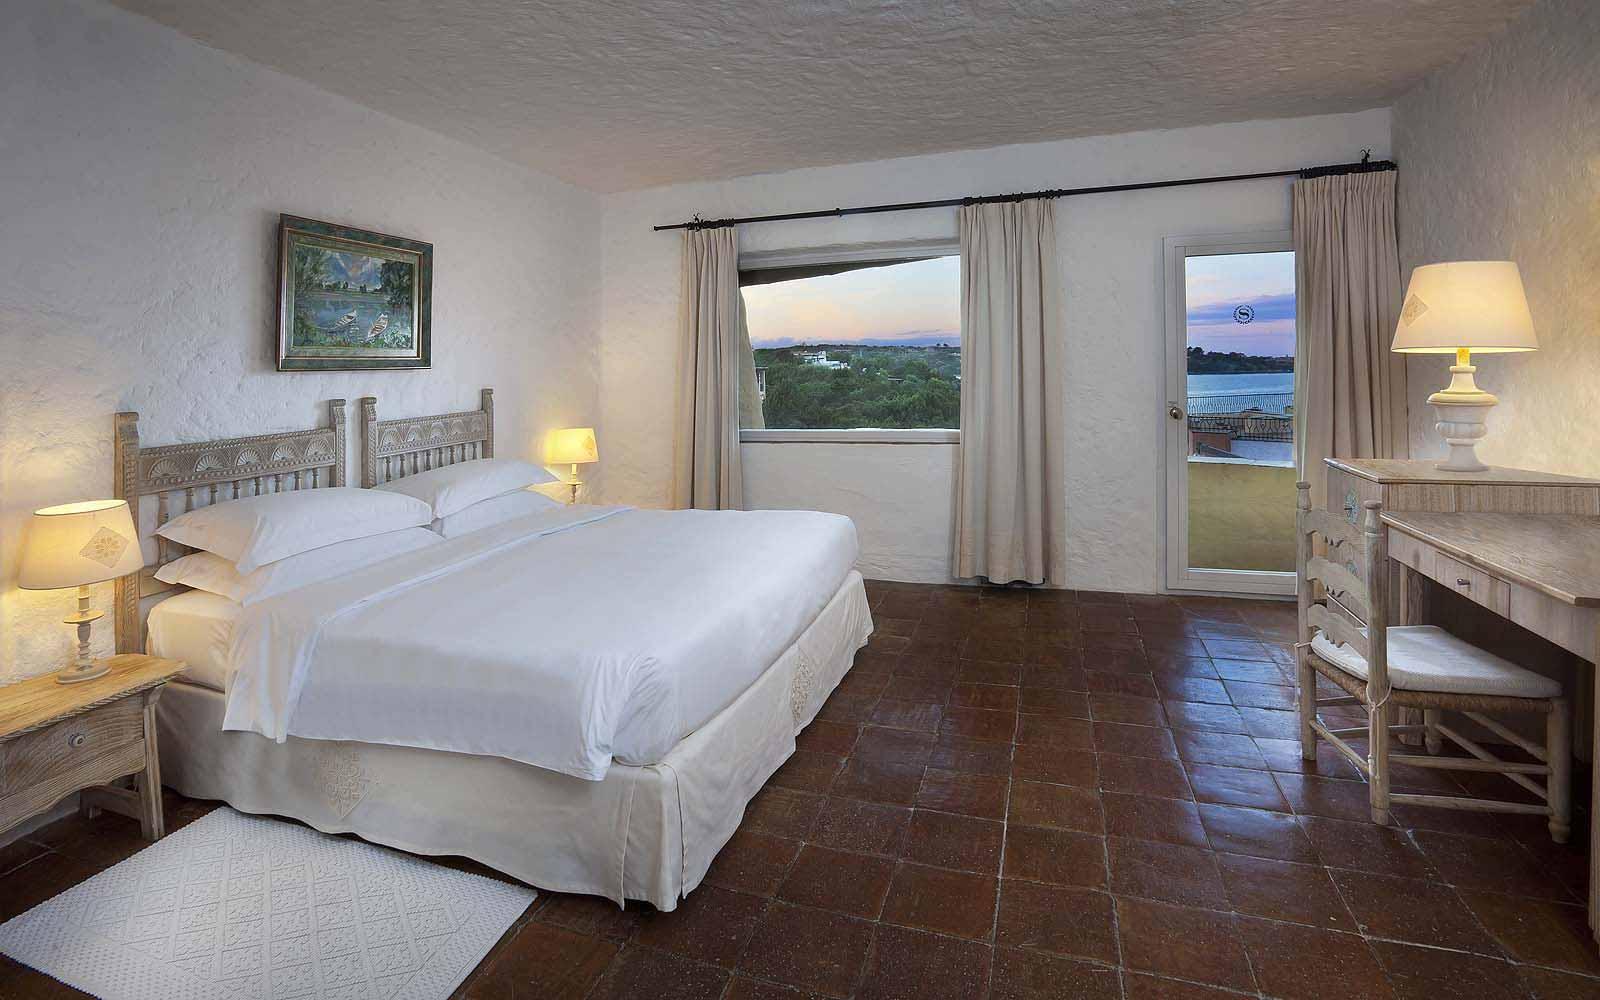 A Premium Room at the Hotel Cervo